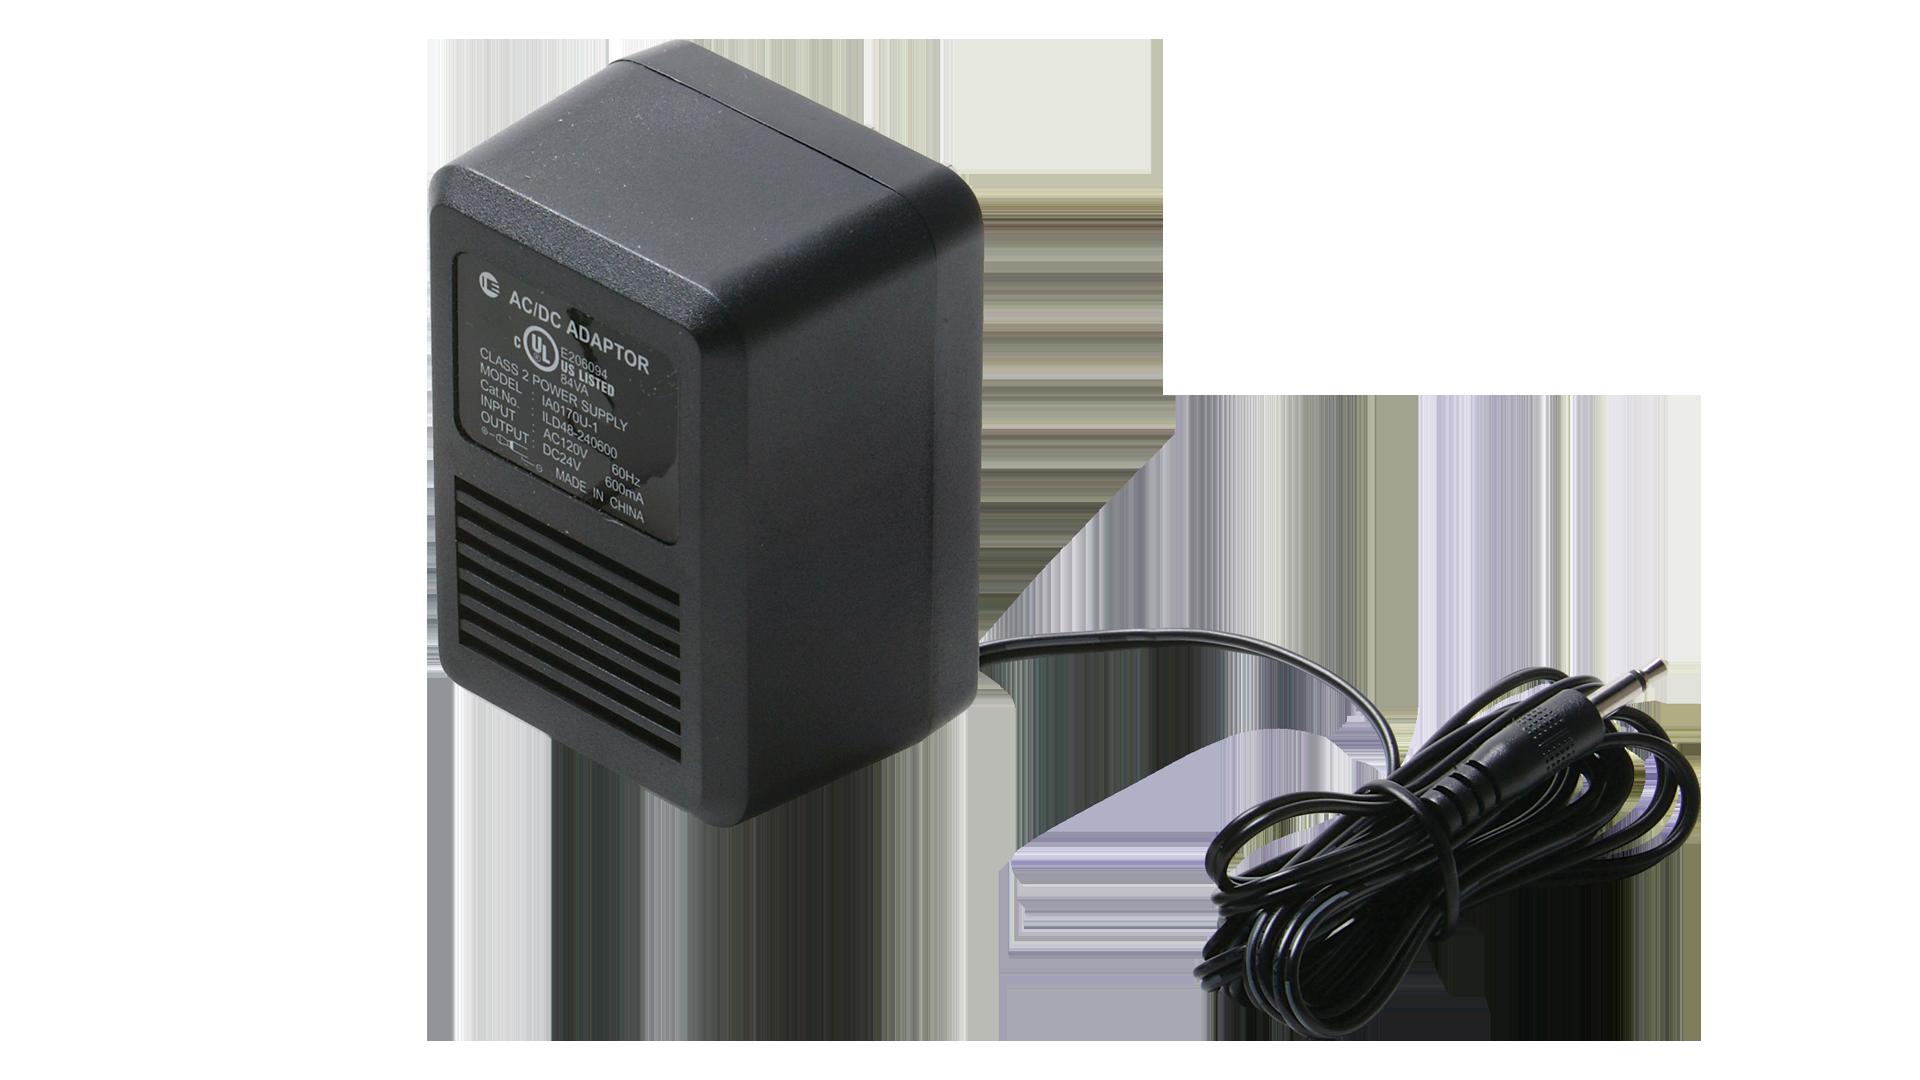 SPI-14/18-2150: 400 MHz to 2150 MHz, Satellite Inline Power Inserter